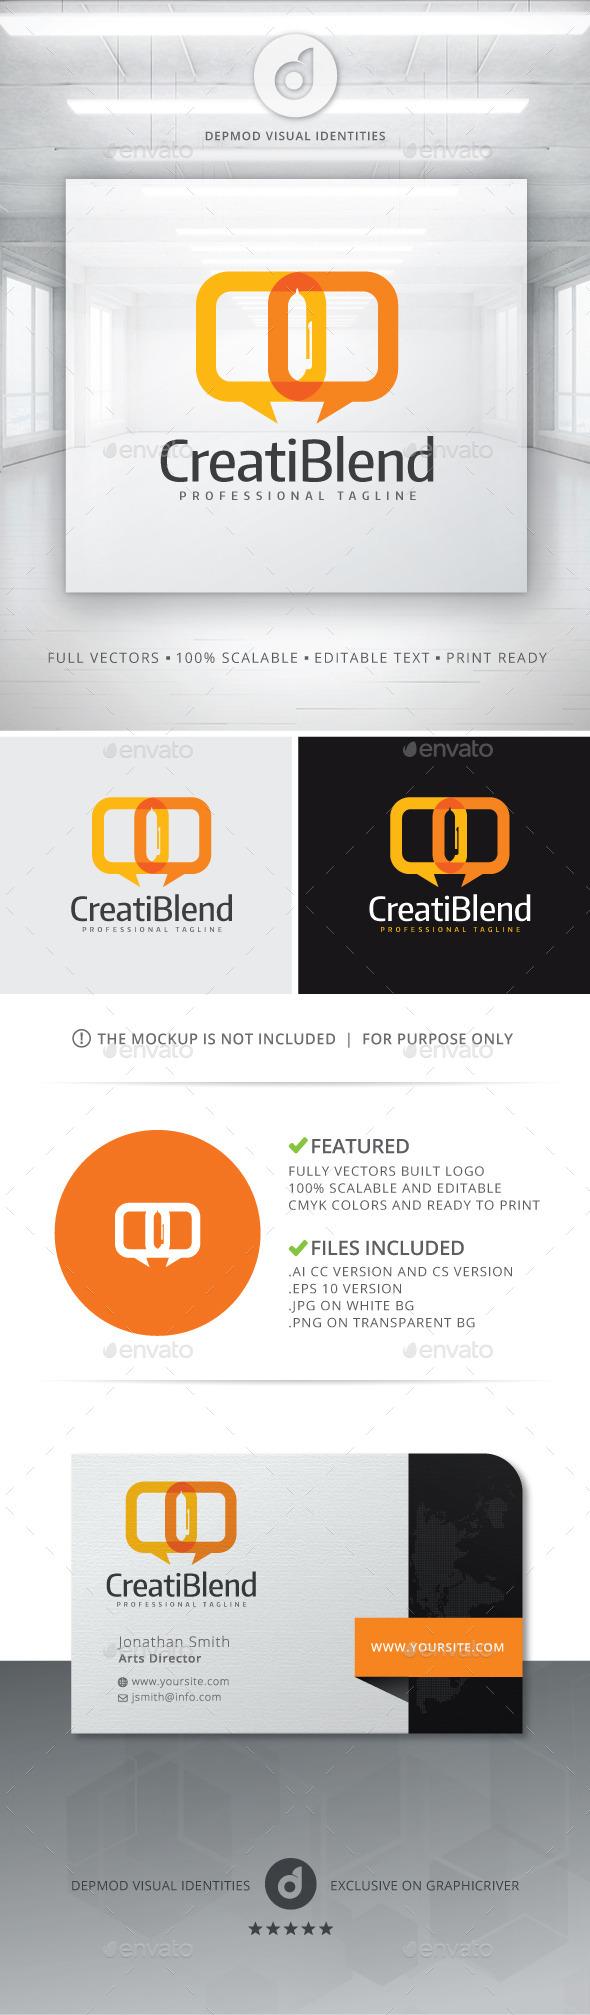 GraphicRiver CreatiBlend Logo 10906743